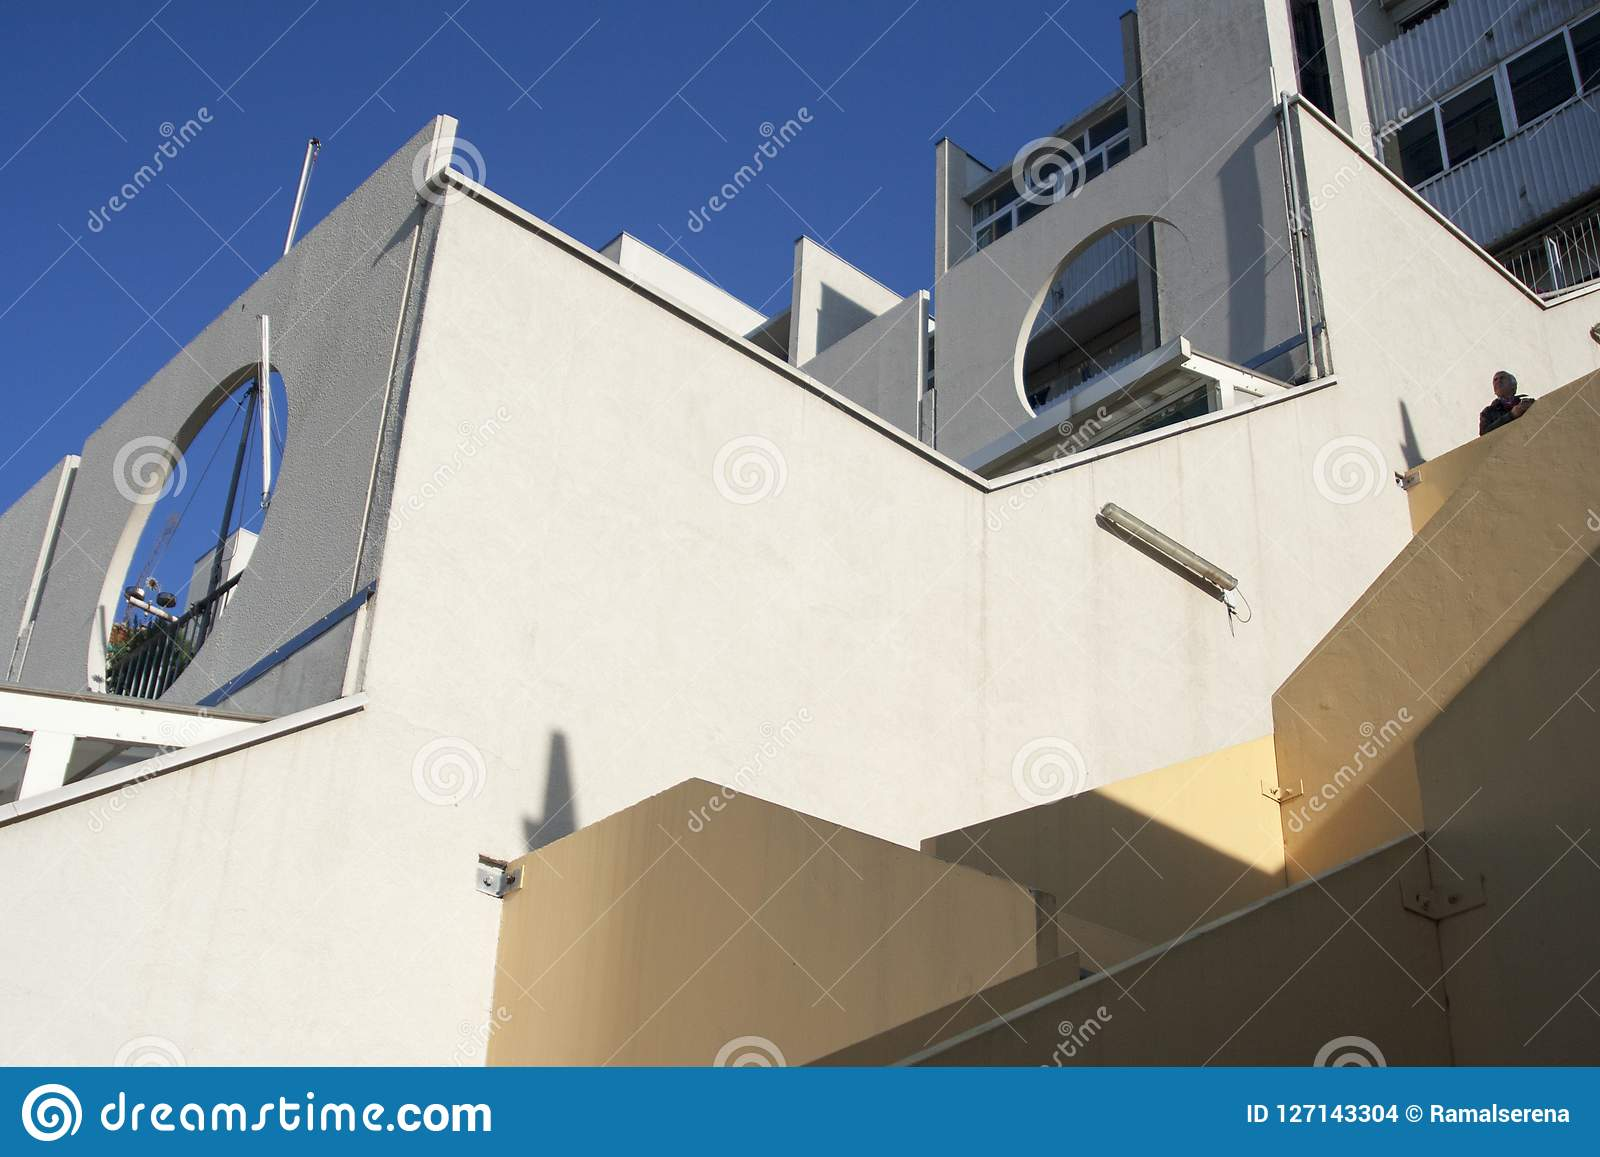 O detalhe de casas populares rebatizou Lavatrici no oeste Genoese